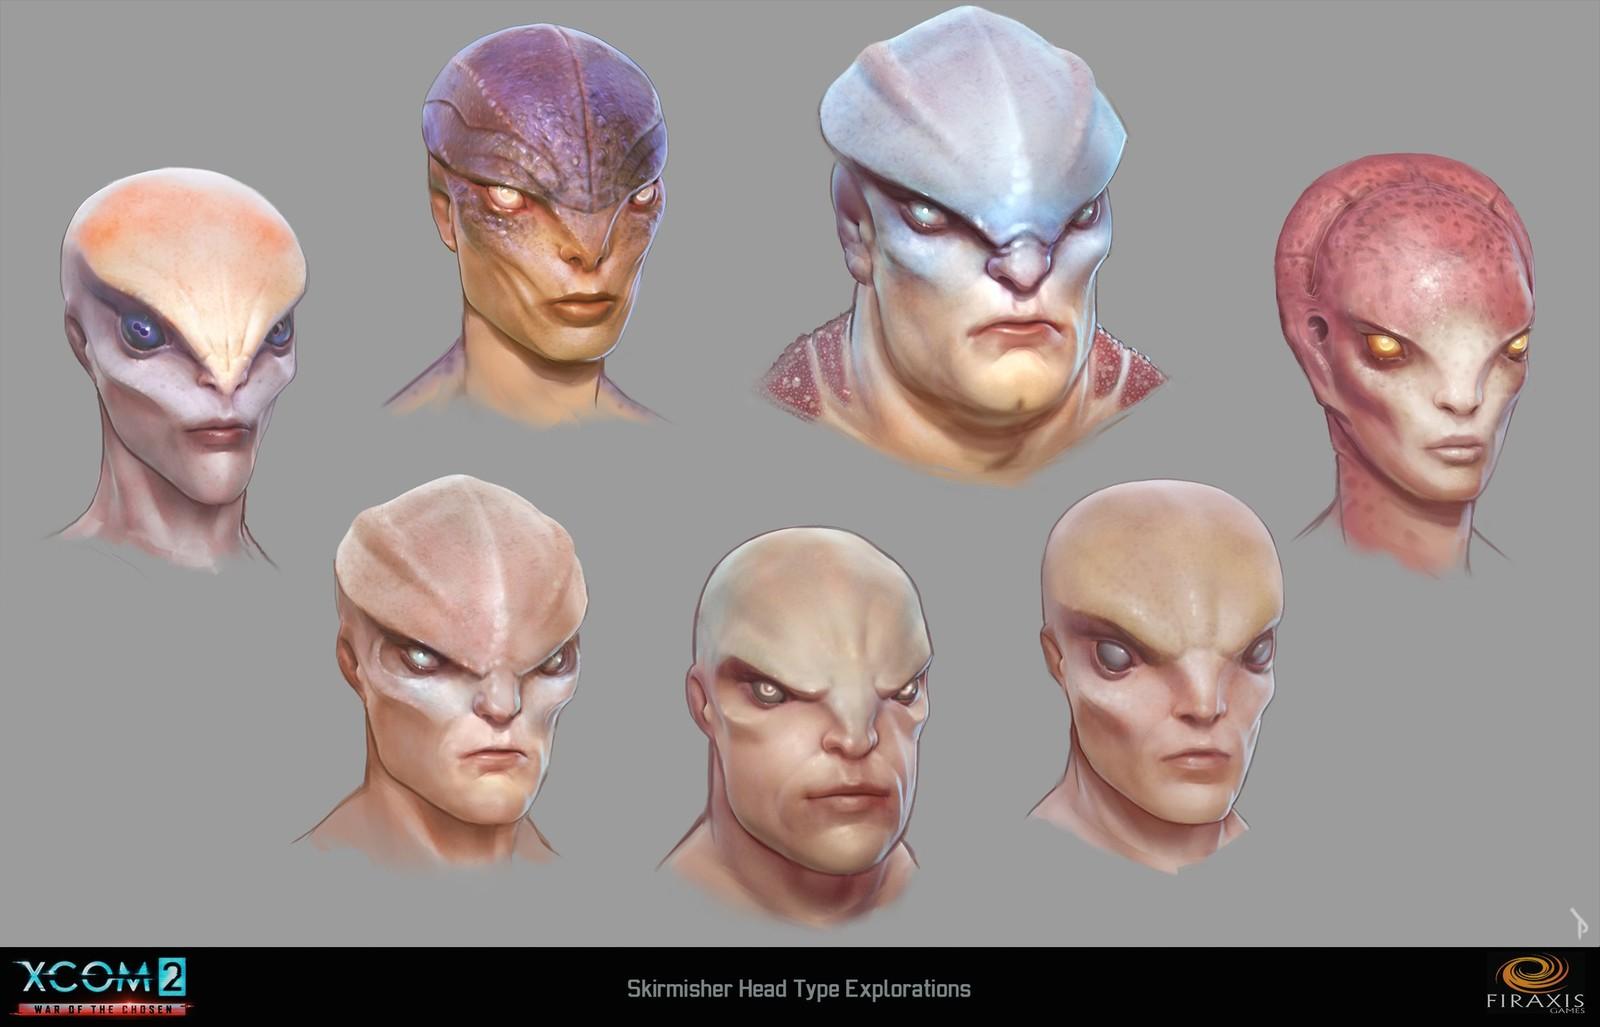 Skirmisher head type studies